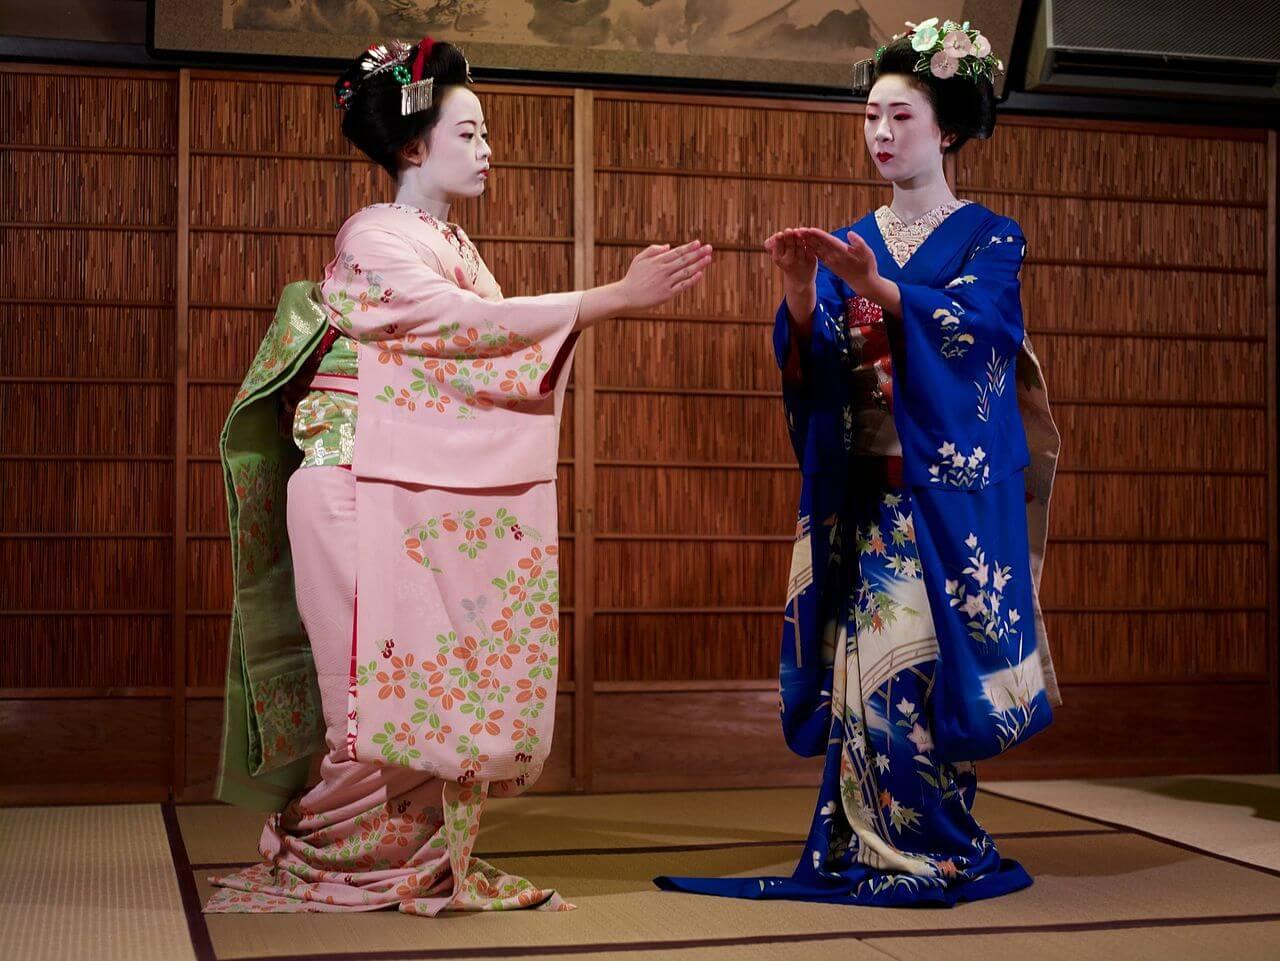 geisha wat is dat